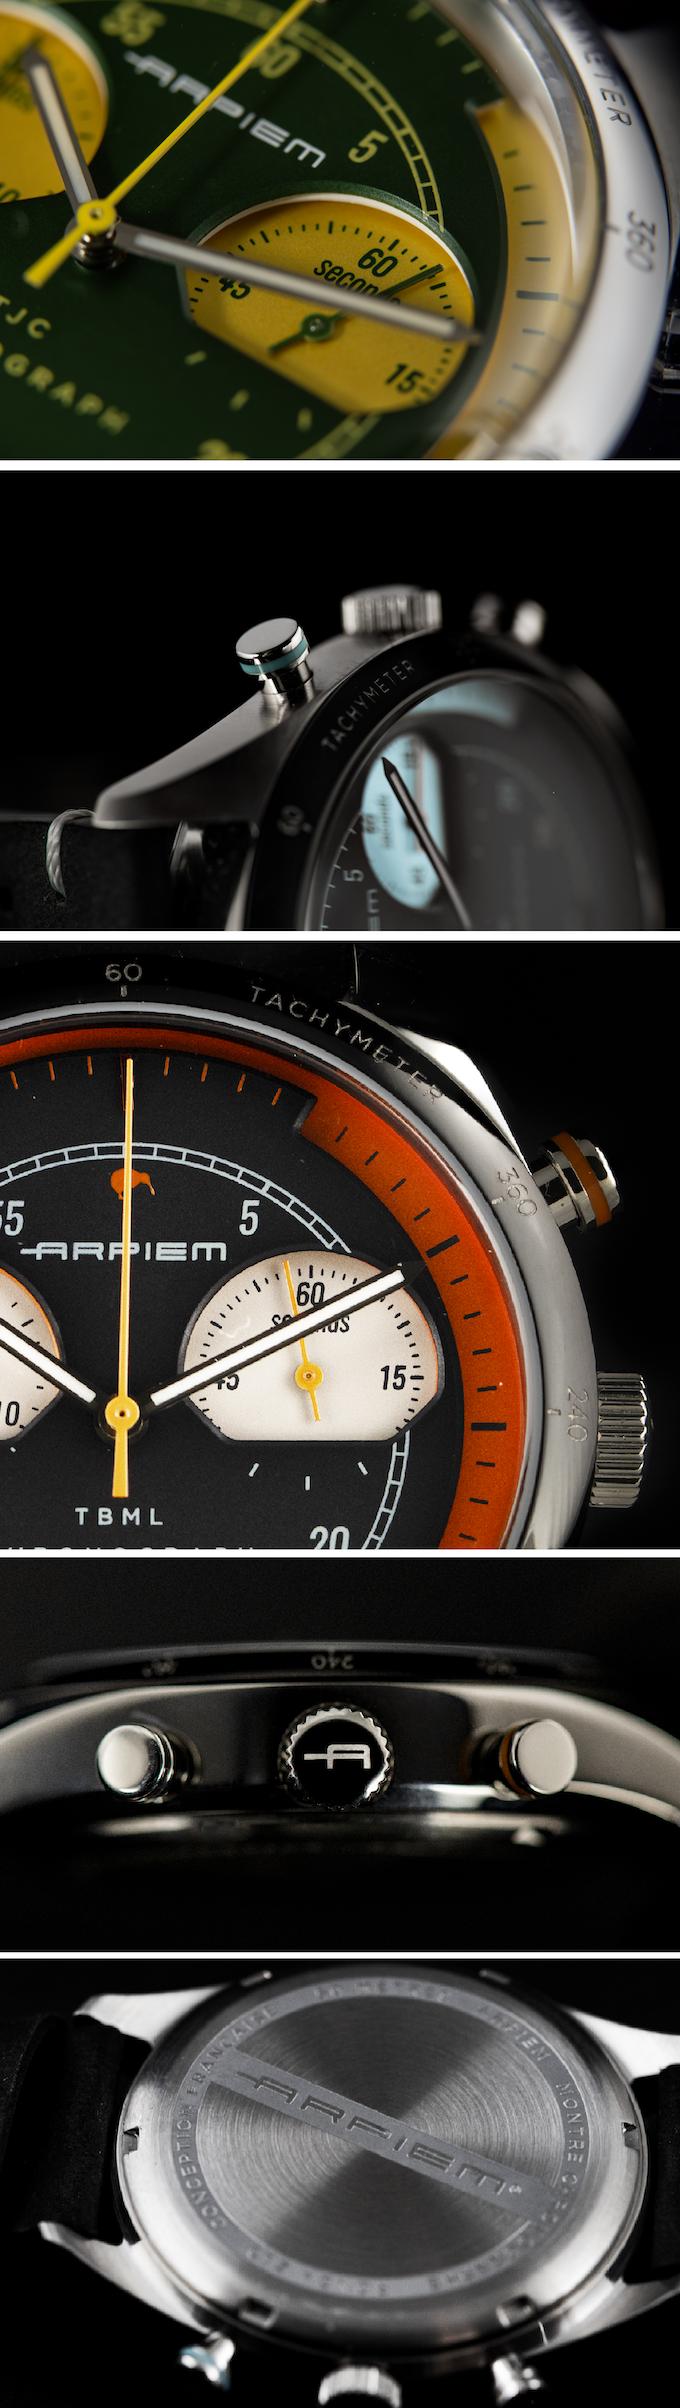 Arpiem Tribute A True Vintage Racing Chronograph Watch By Vincent